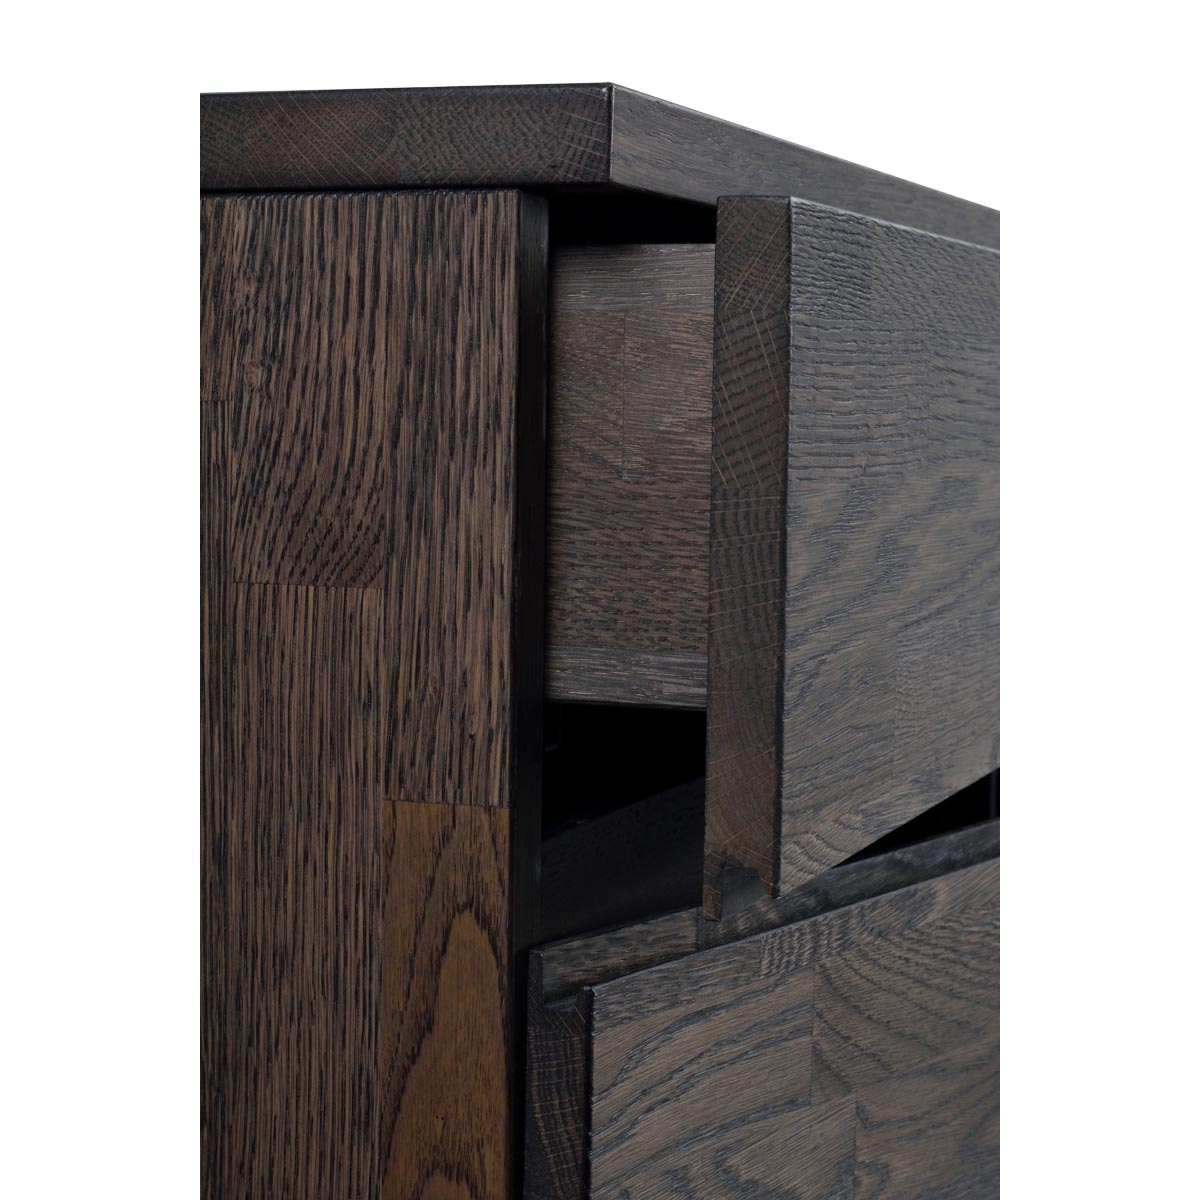 Fred-sideboard-R-117431_detalj